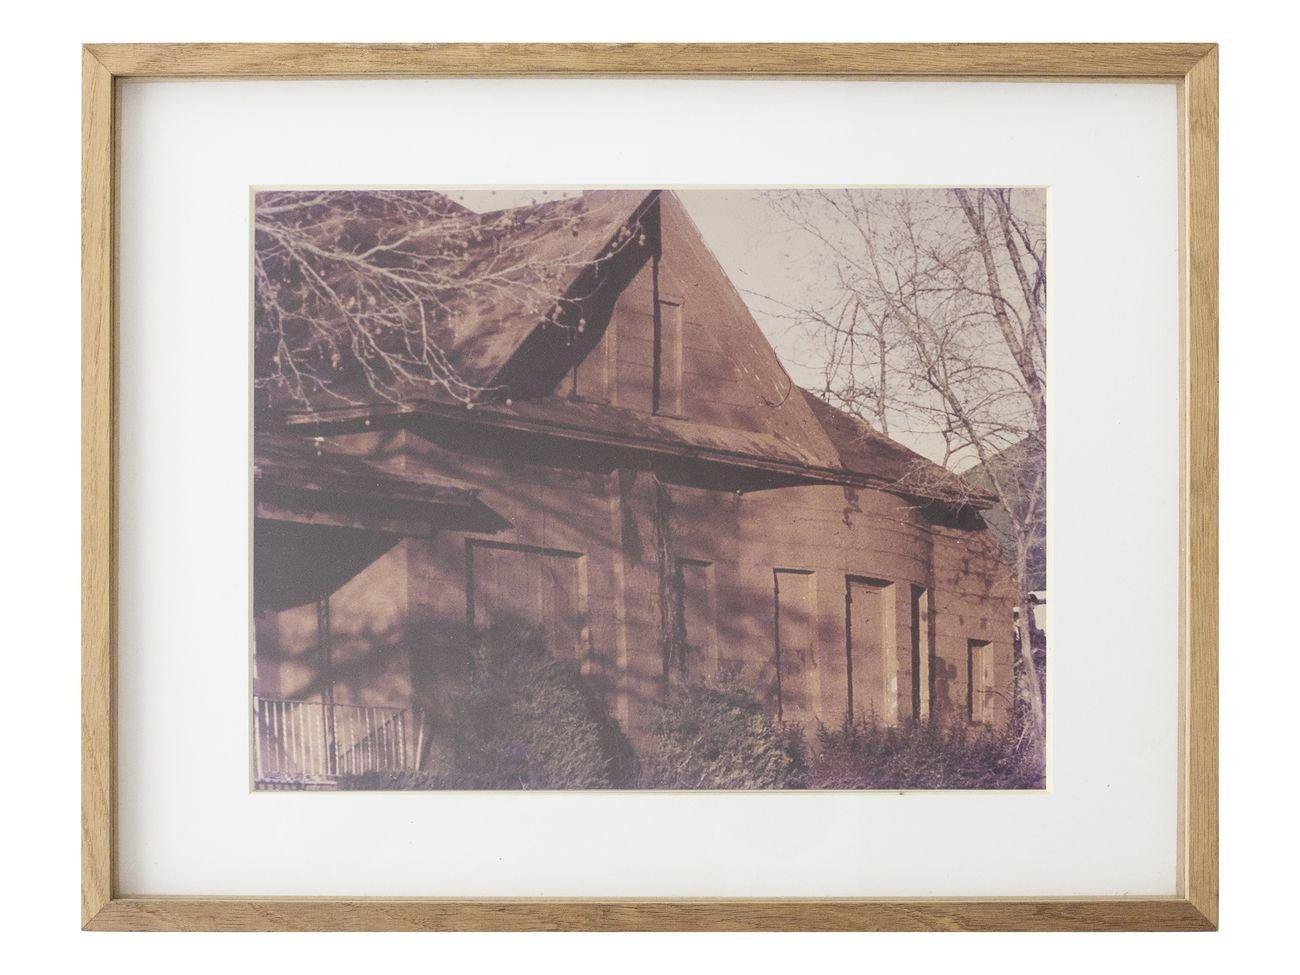 Gianni Pettena, Clay House, Salt Lake Trilogy, 1972. Vintage print